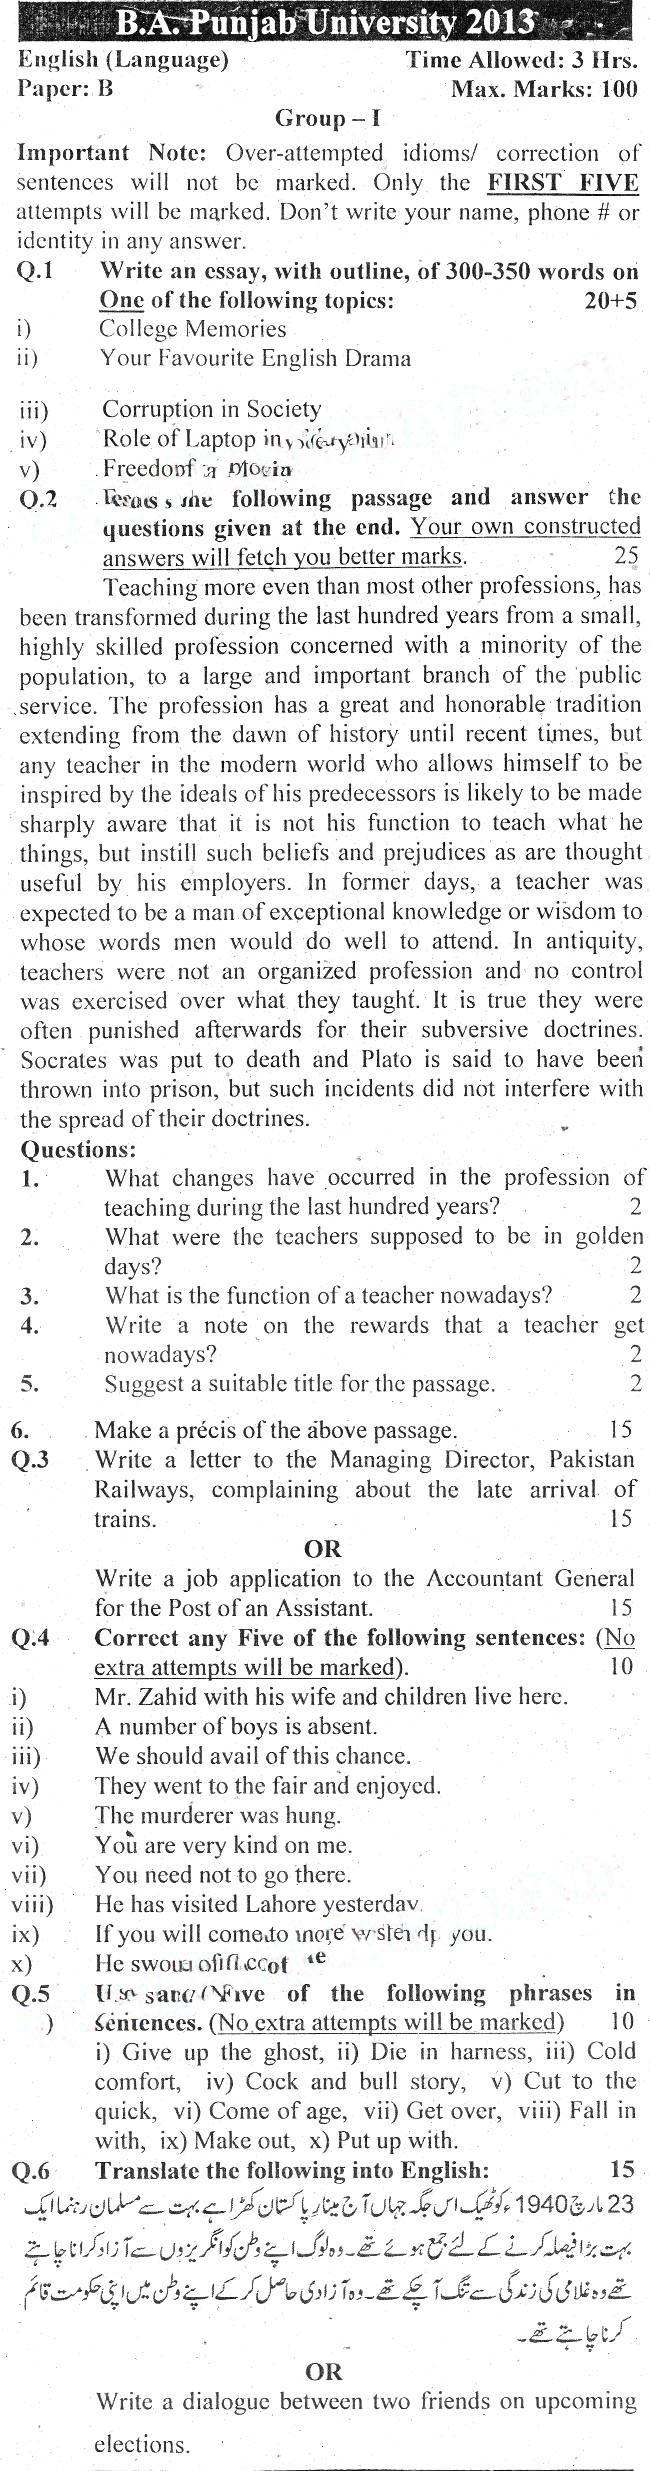 Punjab University Past Papers 2018, 2017, 2016, pu Past